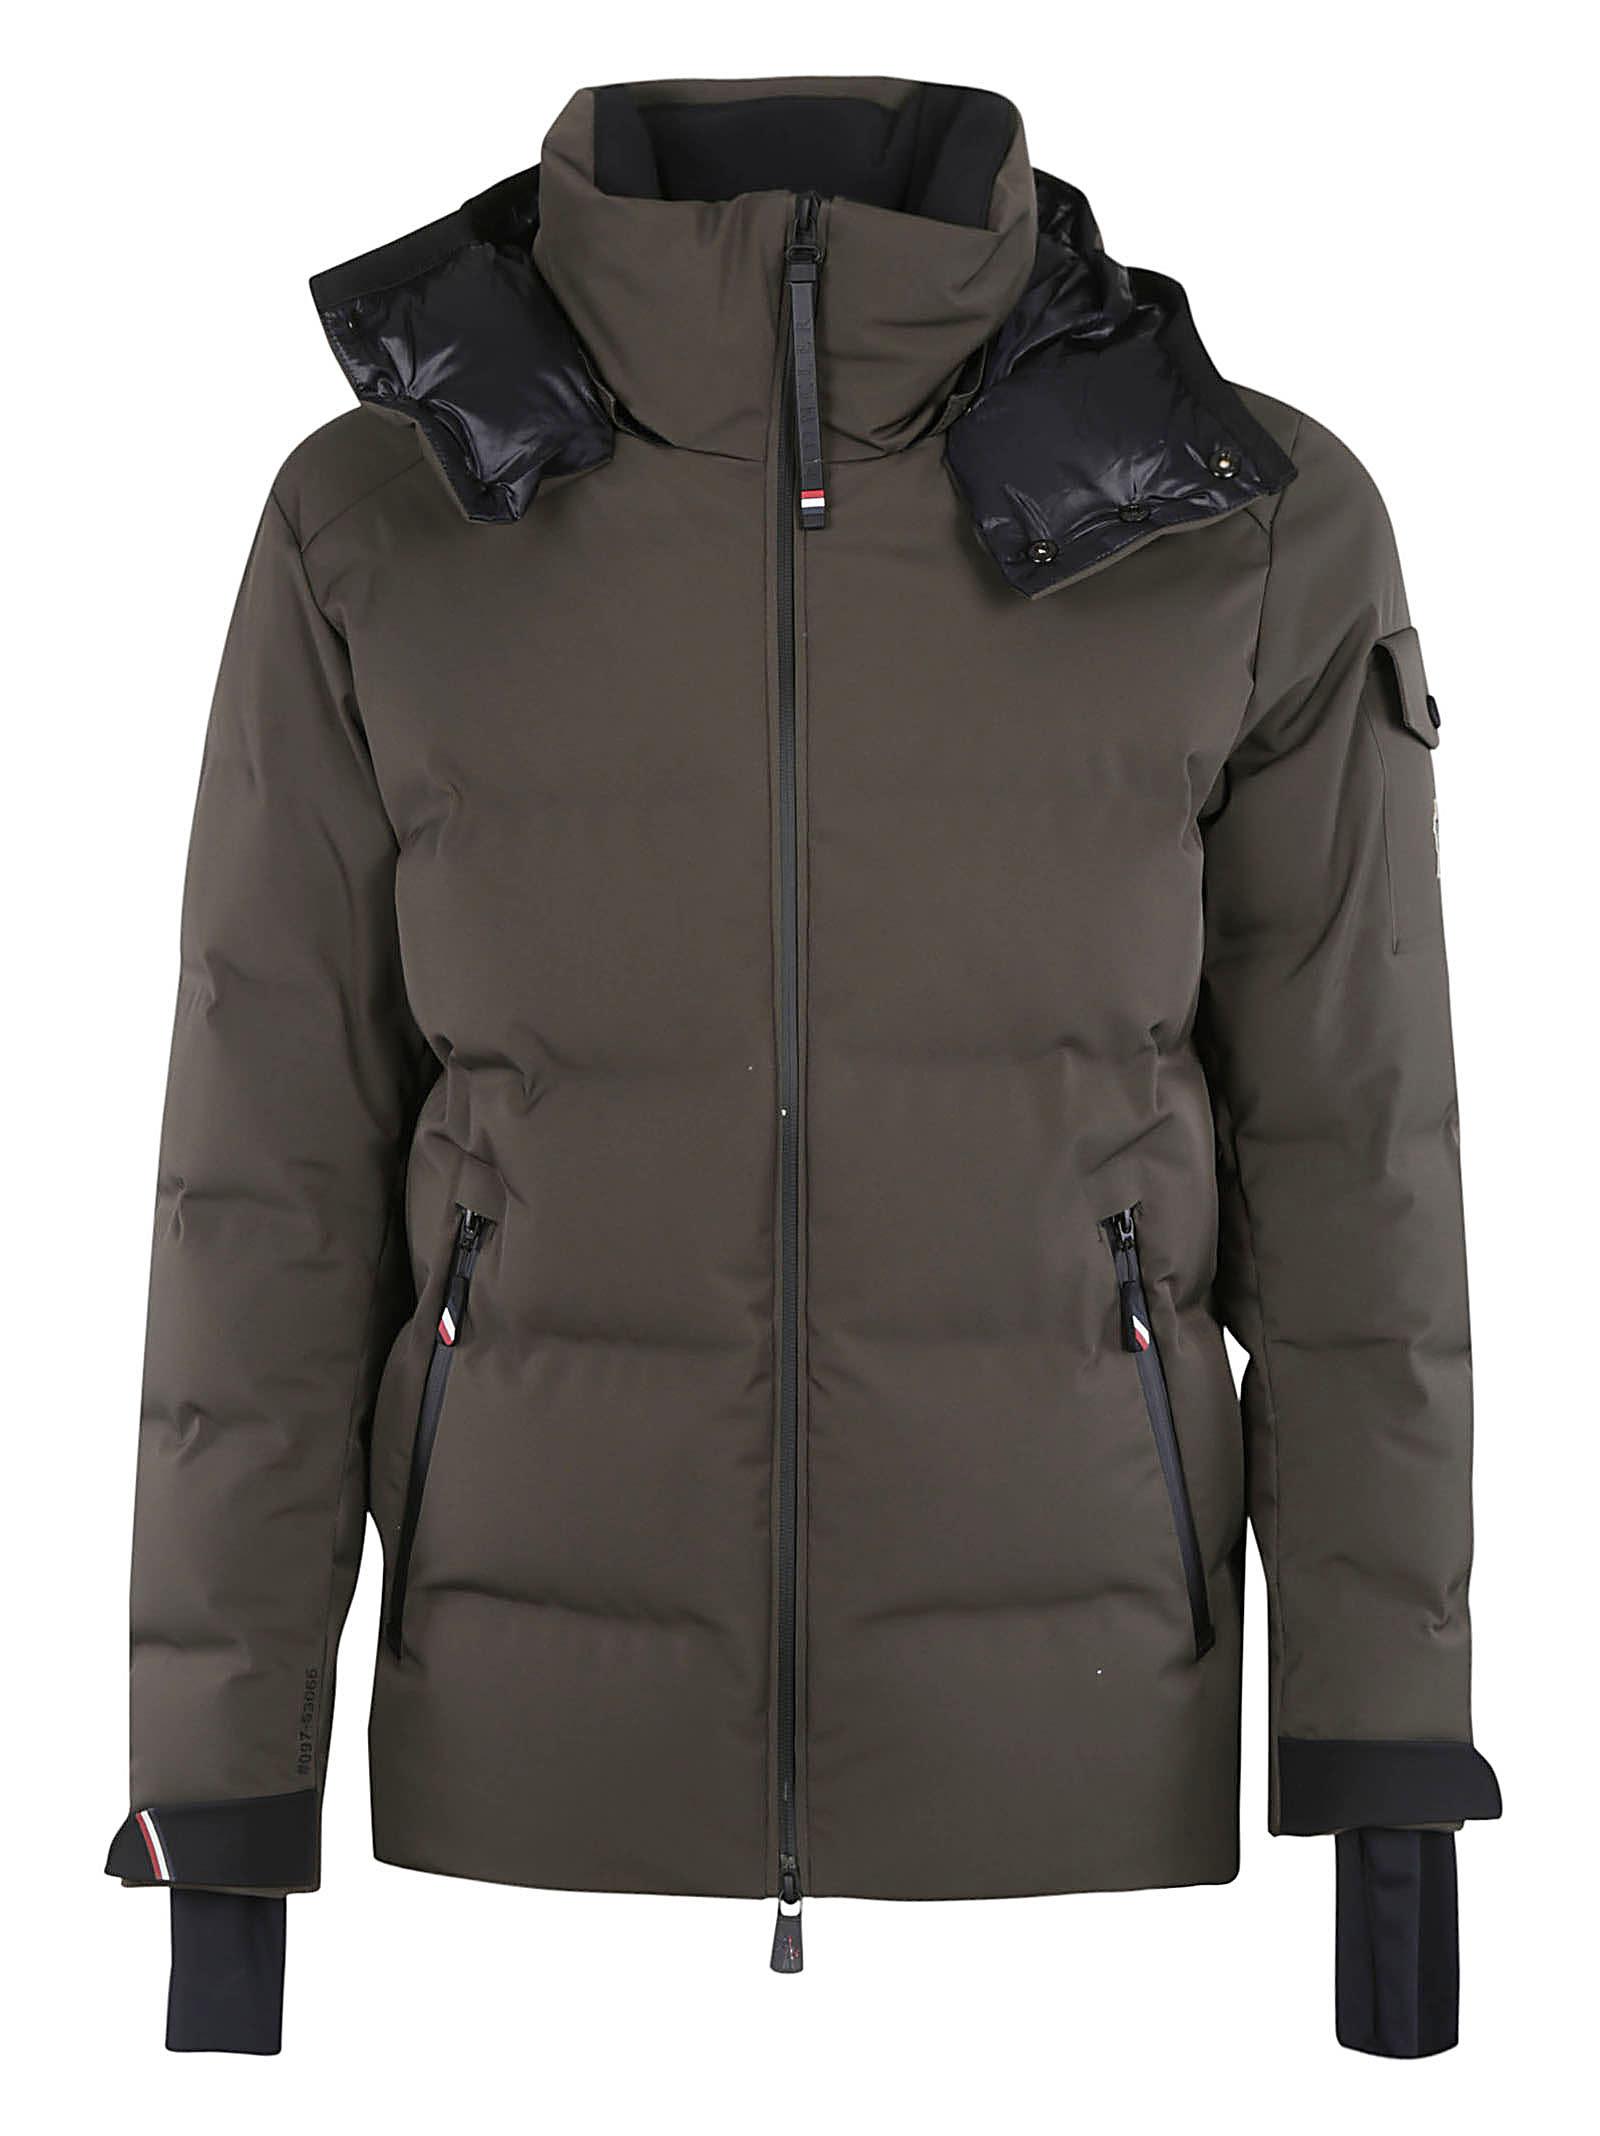 Moncler Grenoble Montgetech Padded Jacket